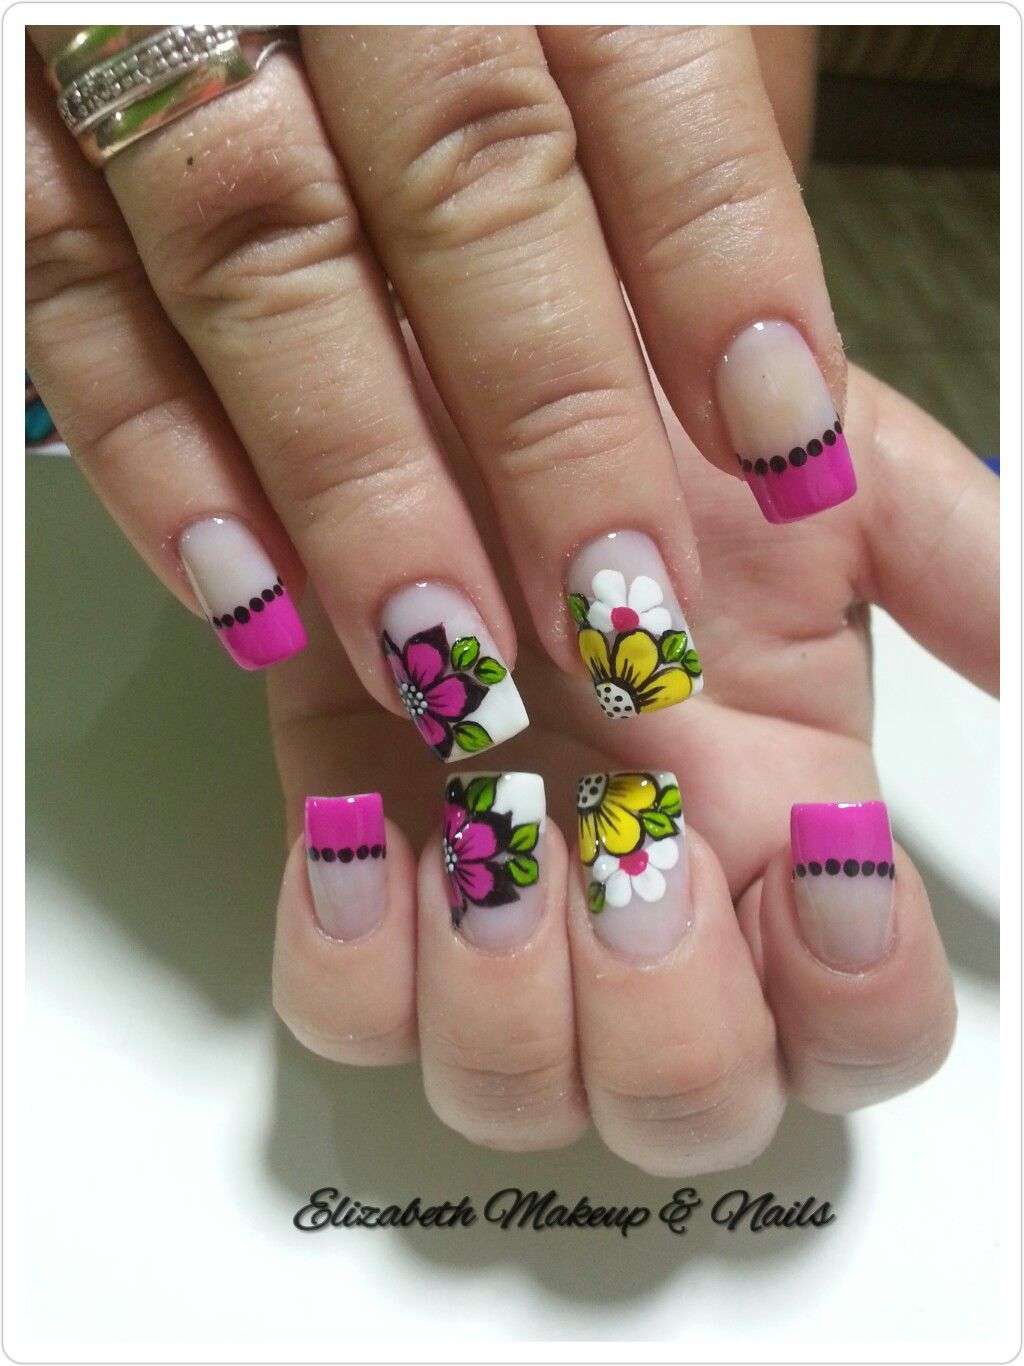 Pin by Nancy de Jesus Tamayo Jimenez on uñas | Pinterest | Manicure ...